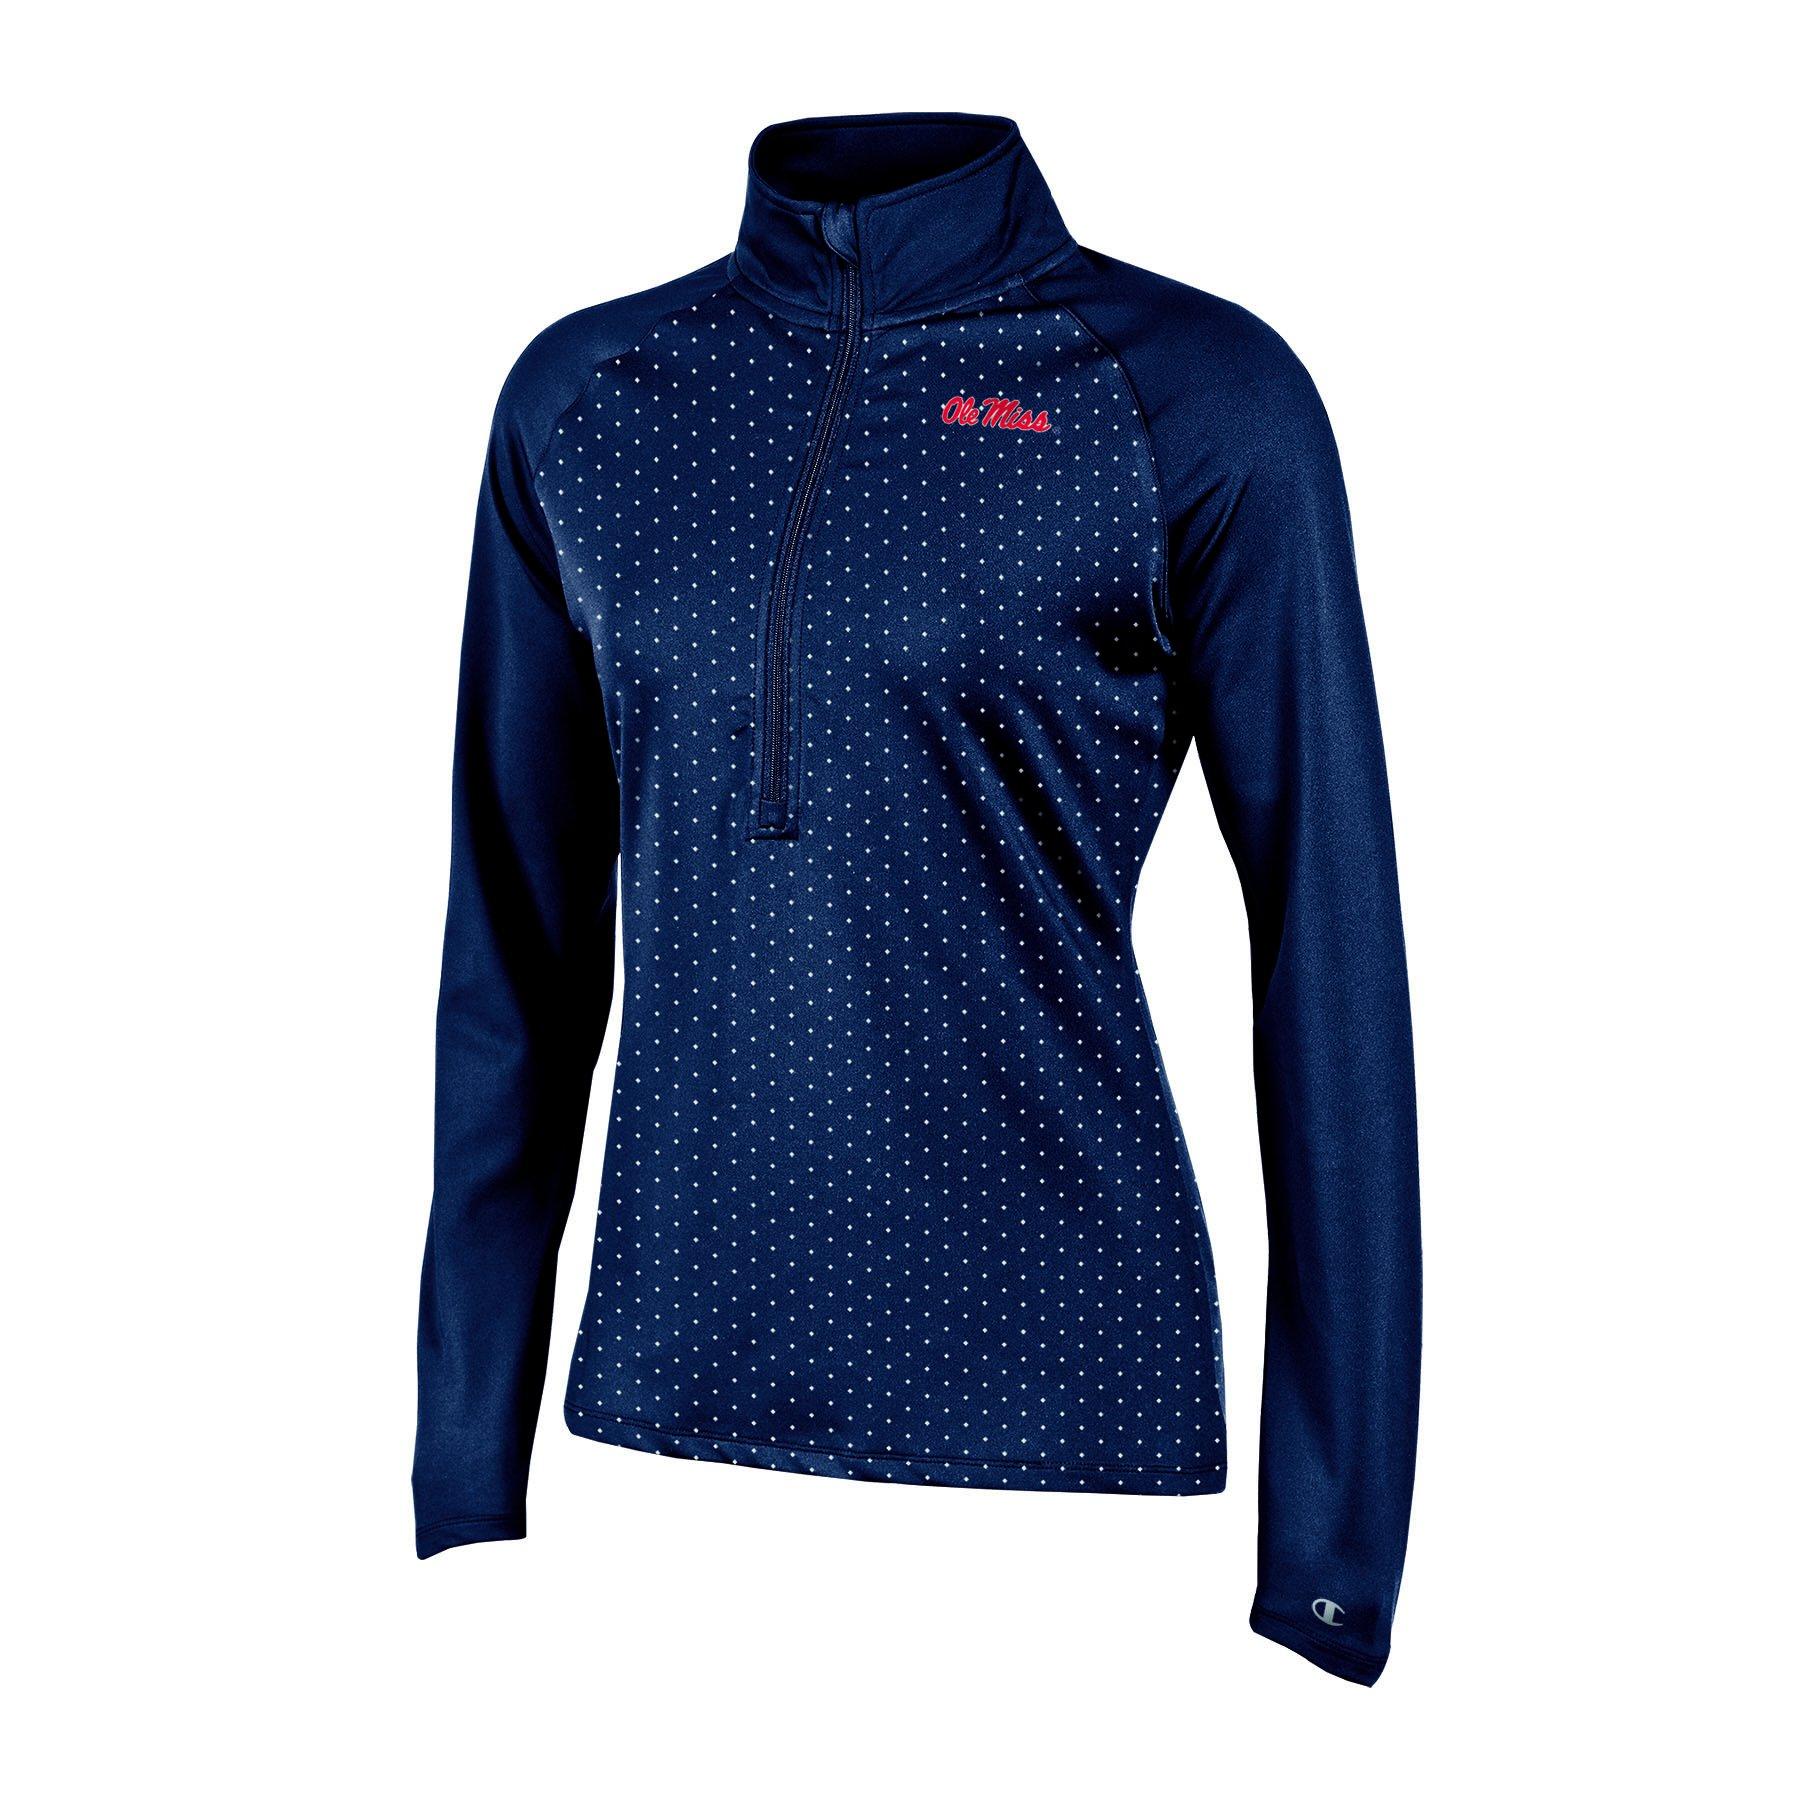 Ouray Sportswear NCAA Texas Tech Red Raiders Womens Dee-lite 1//4 Zip Top X-Large Black